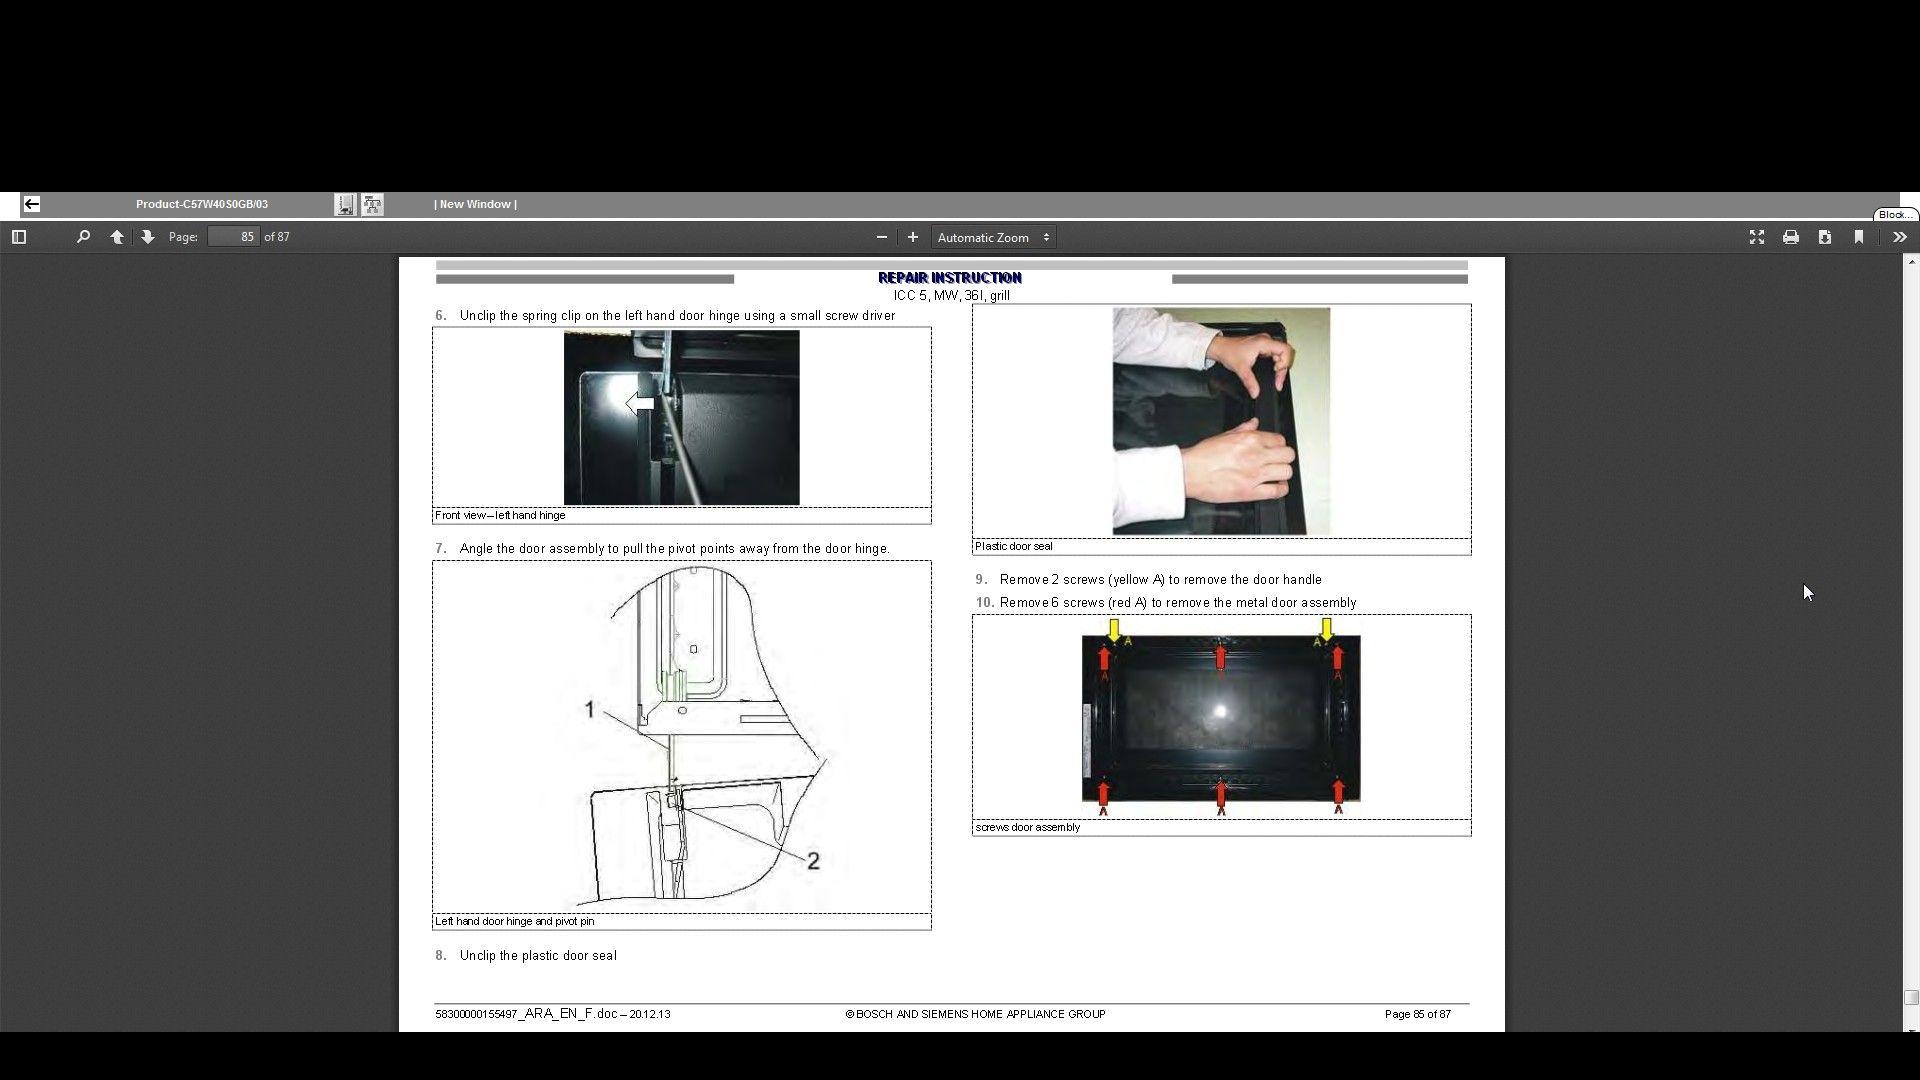 c7233a34-56f5-43d5-bfd7-9b9a78c60f2a_ScreenHunter_1313 Oct. 26 19.55.jpg